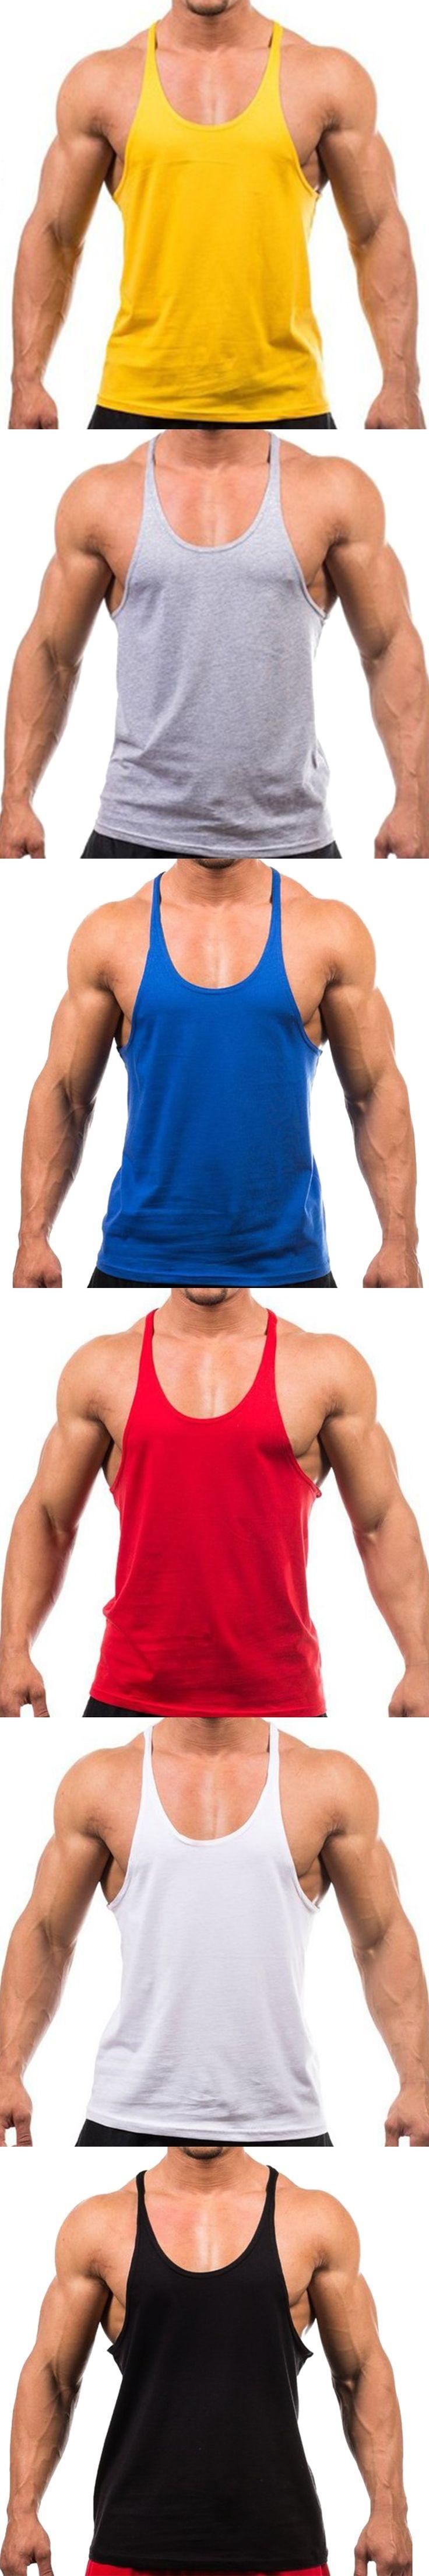 Hot New 2017 Men Tank Top Cotton Soft Fitness Vest For Men Bodybuilding Tank Tops Casual Clothing Men Solid 6Color M-XXL